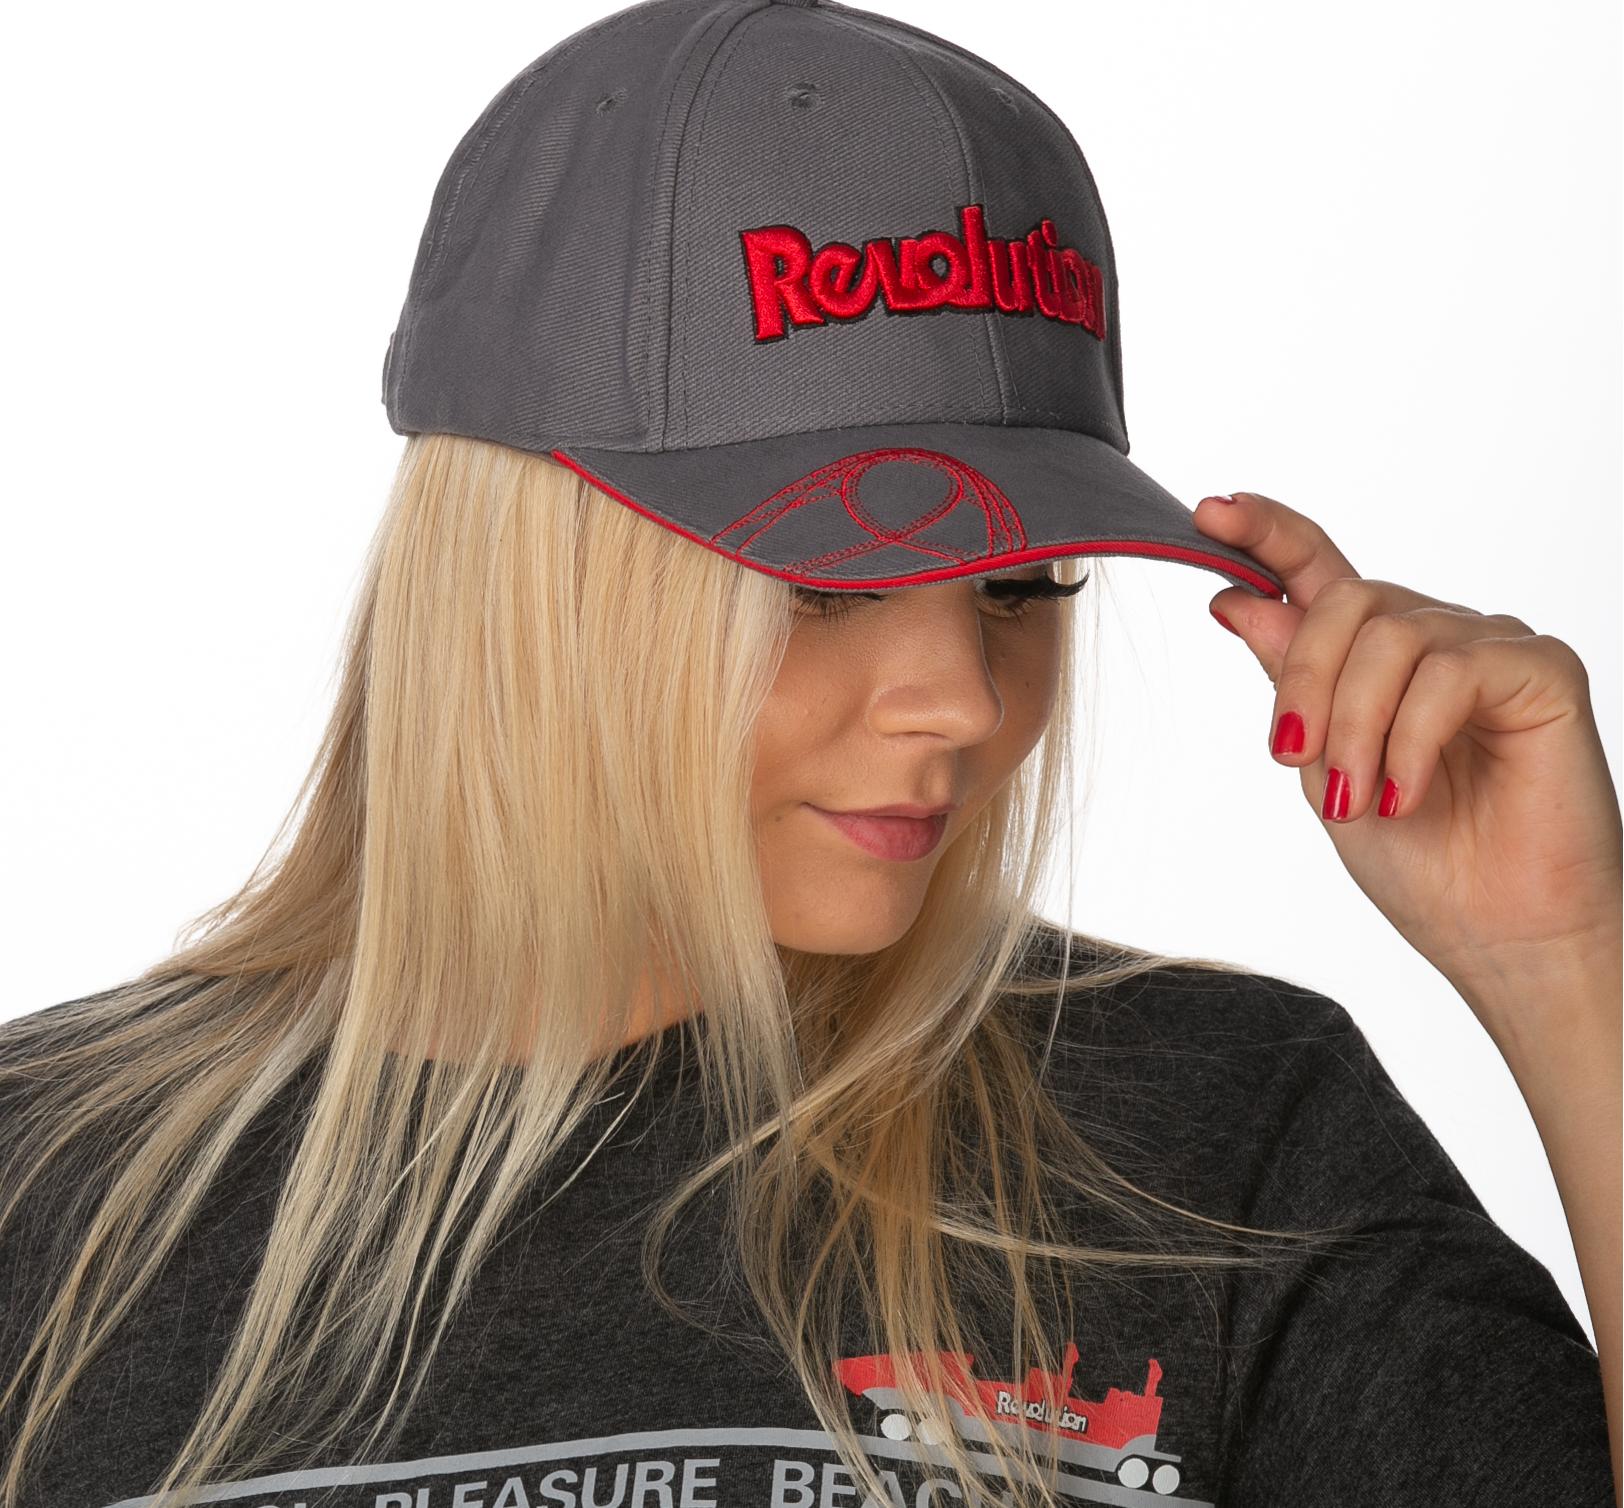 Revolution Cap Profile